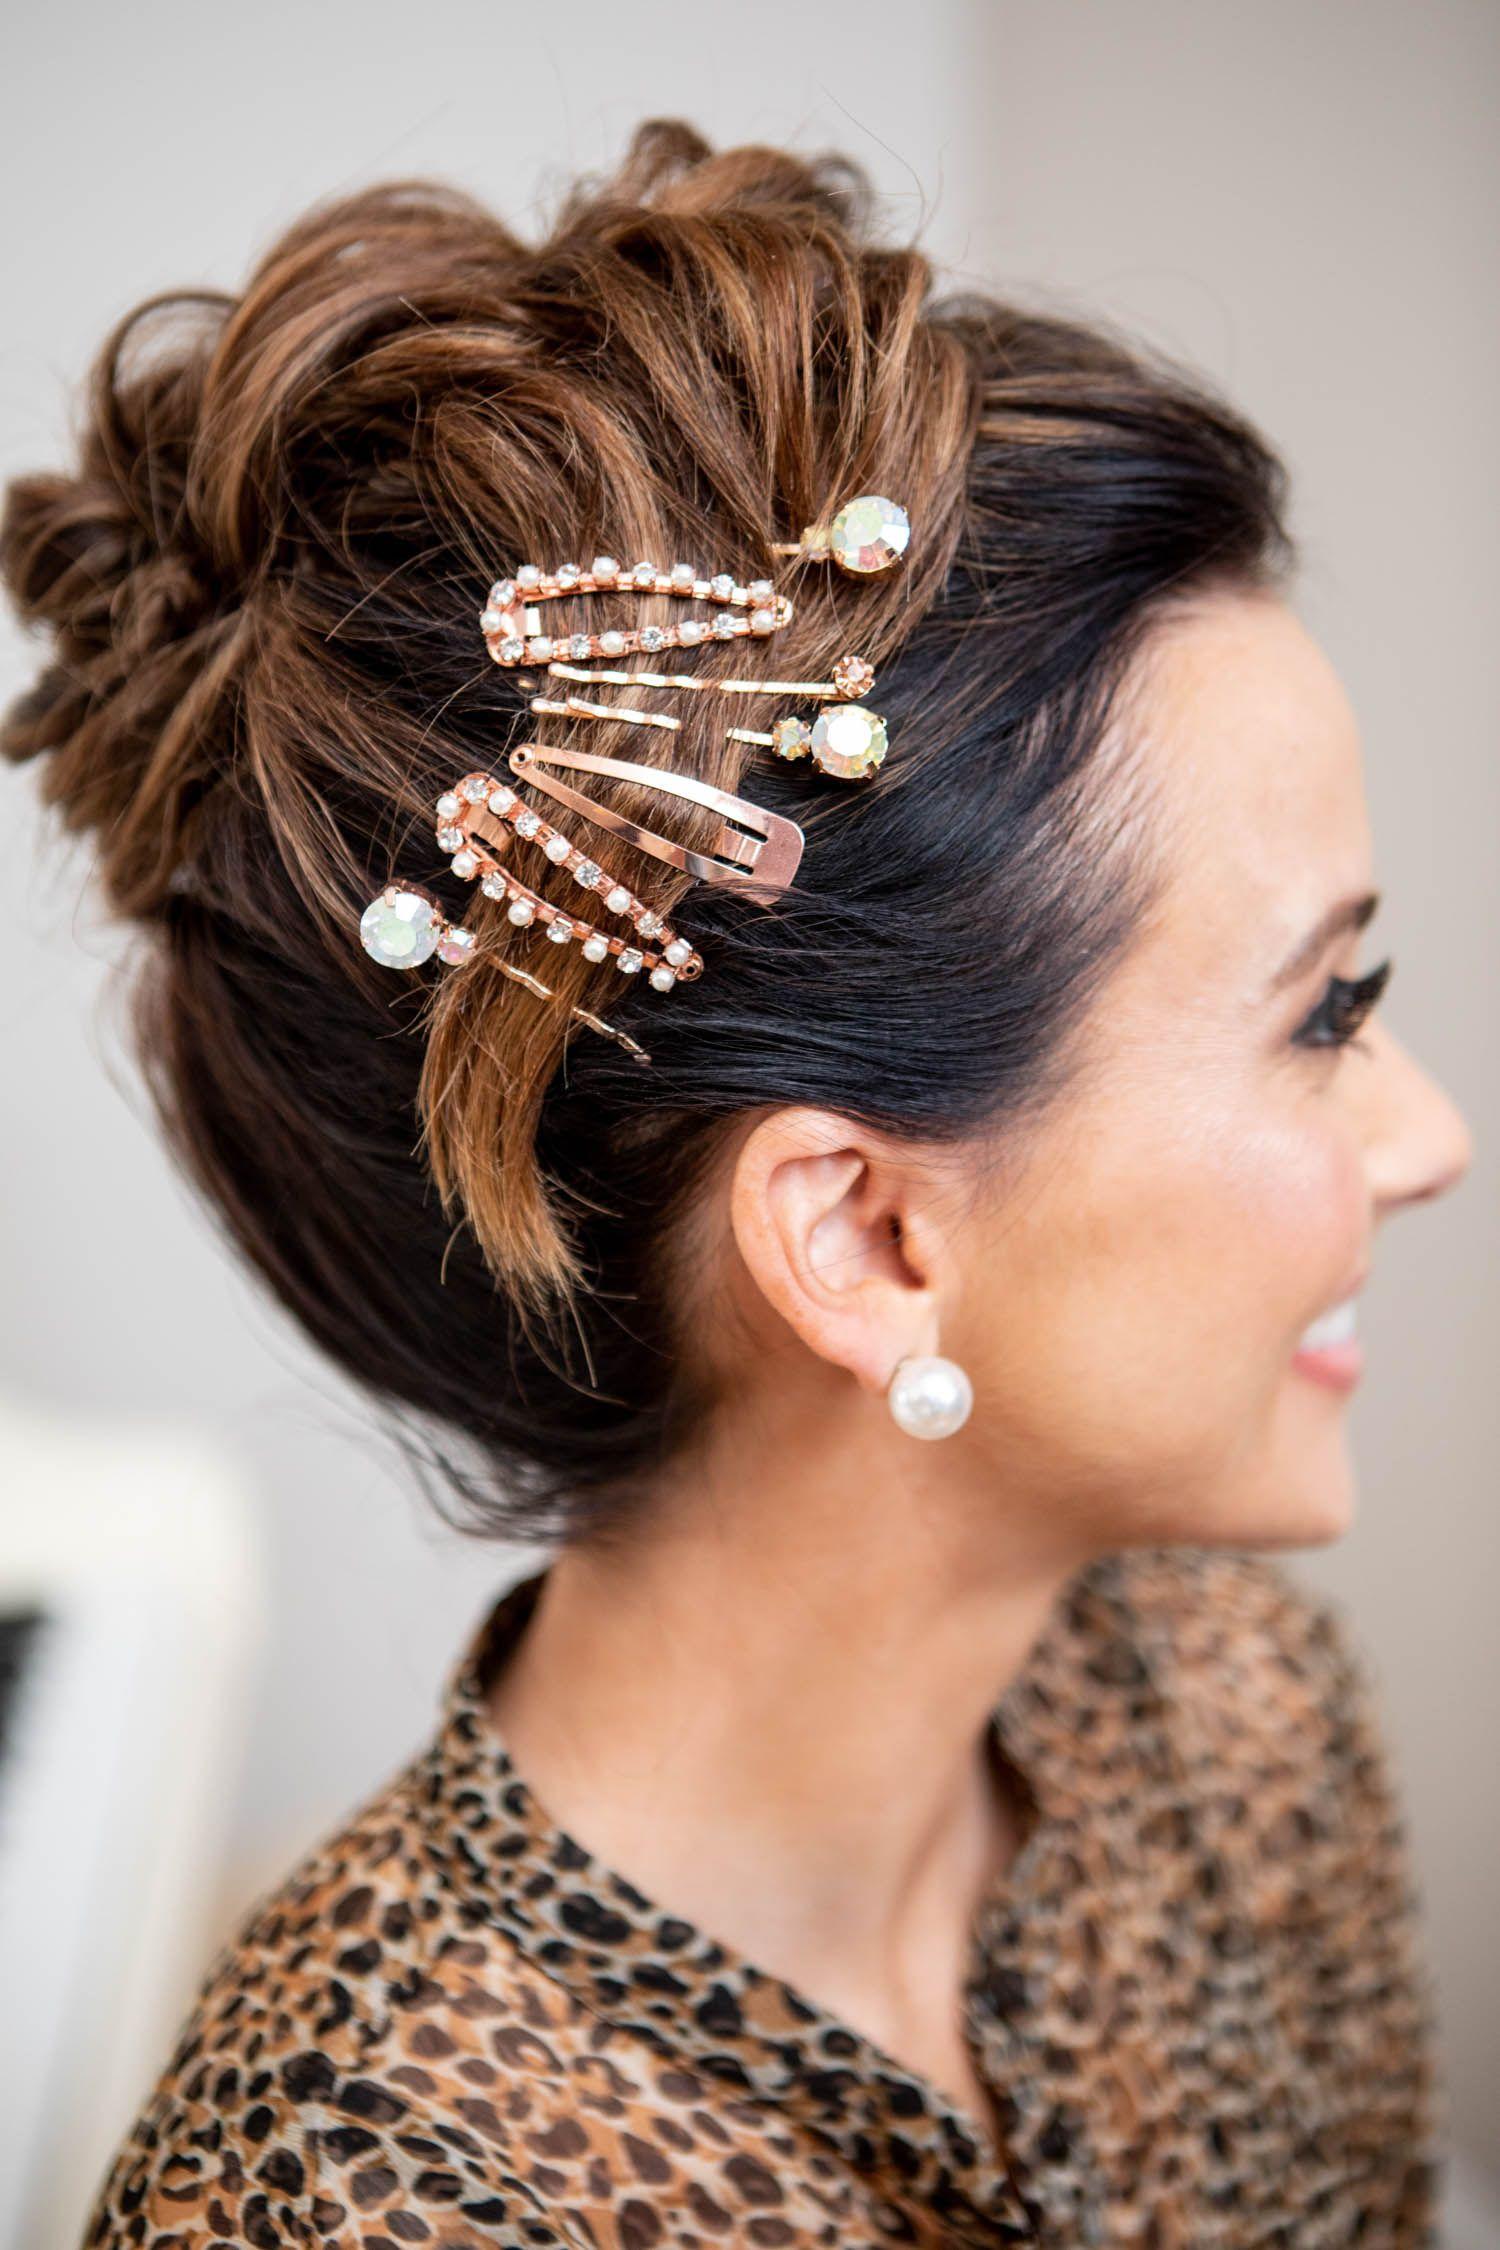 Hair Accessories Brands